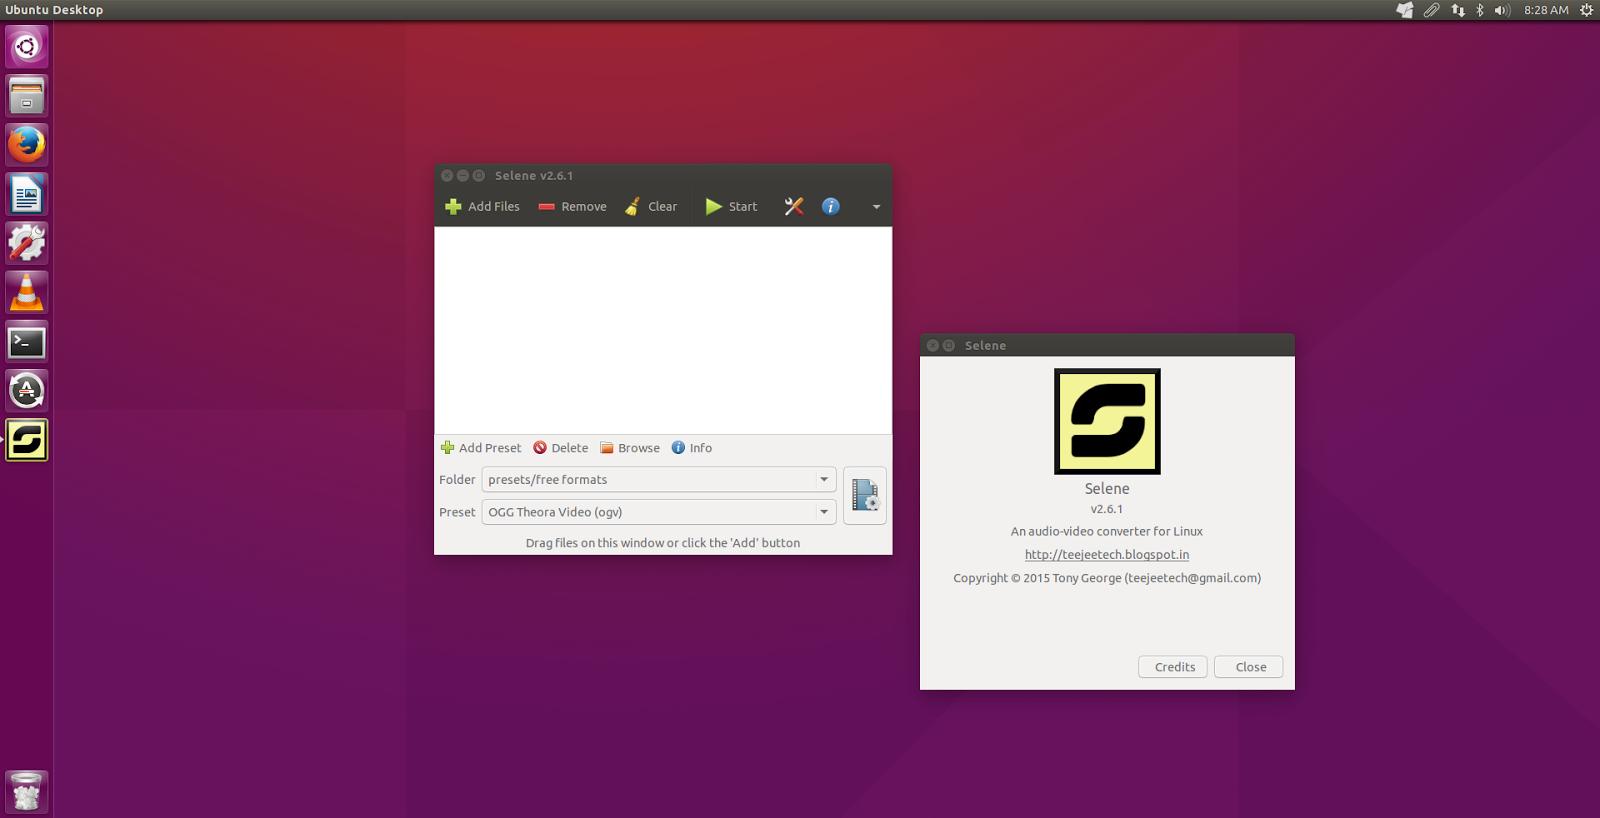 Ubuntu Alive, Explore, And Learn : Selene 2 6 1 Video